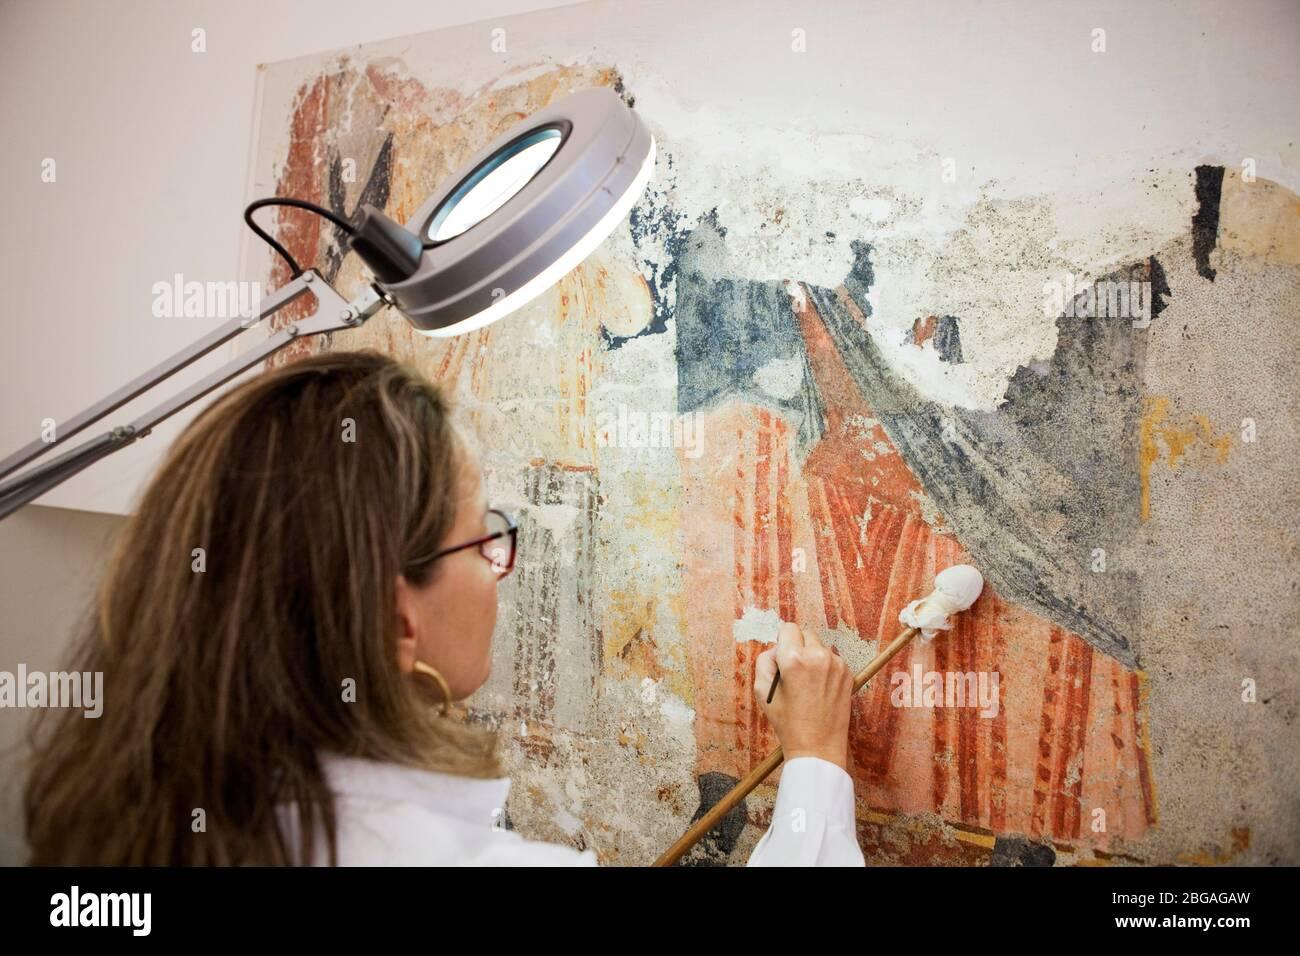 Paz MarquŽs, conservadora-restauradora de lÕËrea, especializada en pintura mural, treballant en un fragmento de pintura mural romˆnica arrenada i trasp Foto de stock